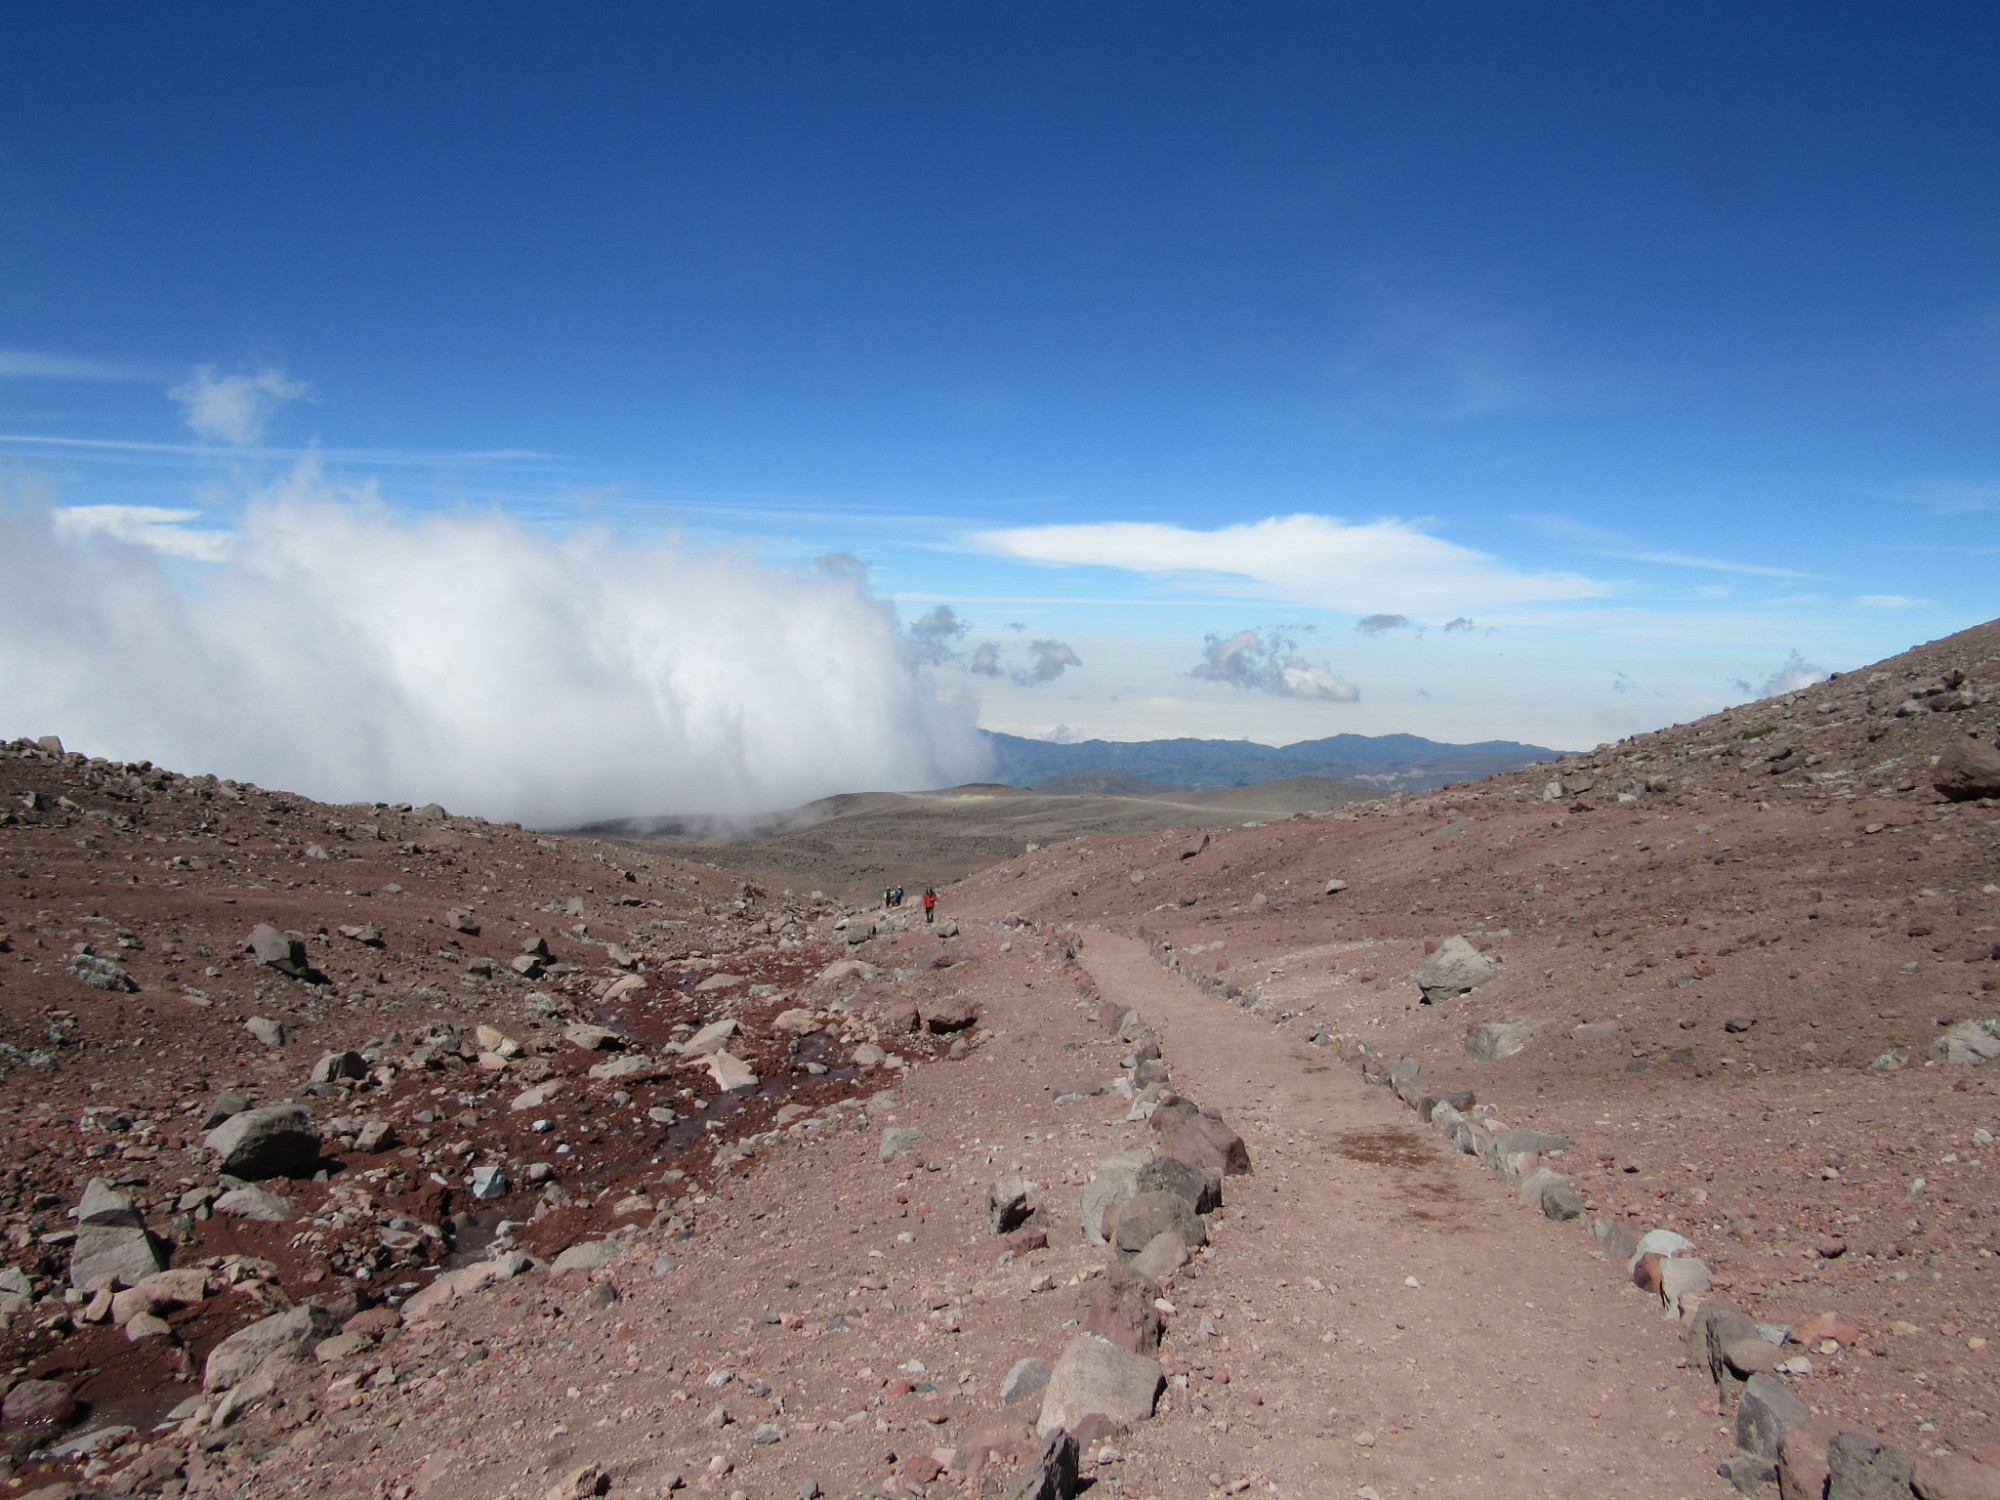 Chemin de randonnée proche du Chimborazo.